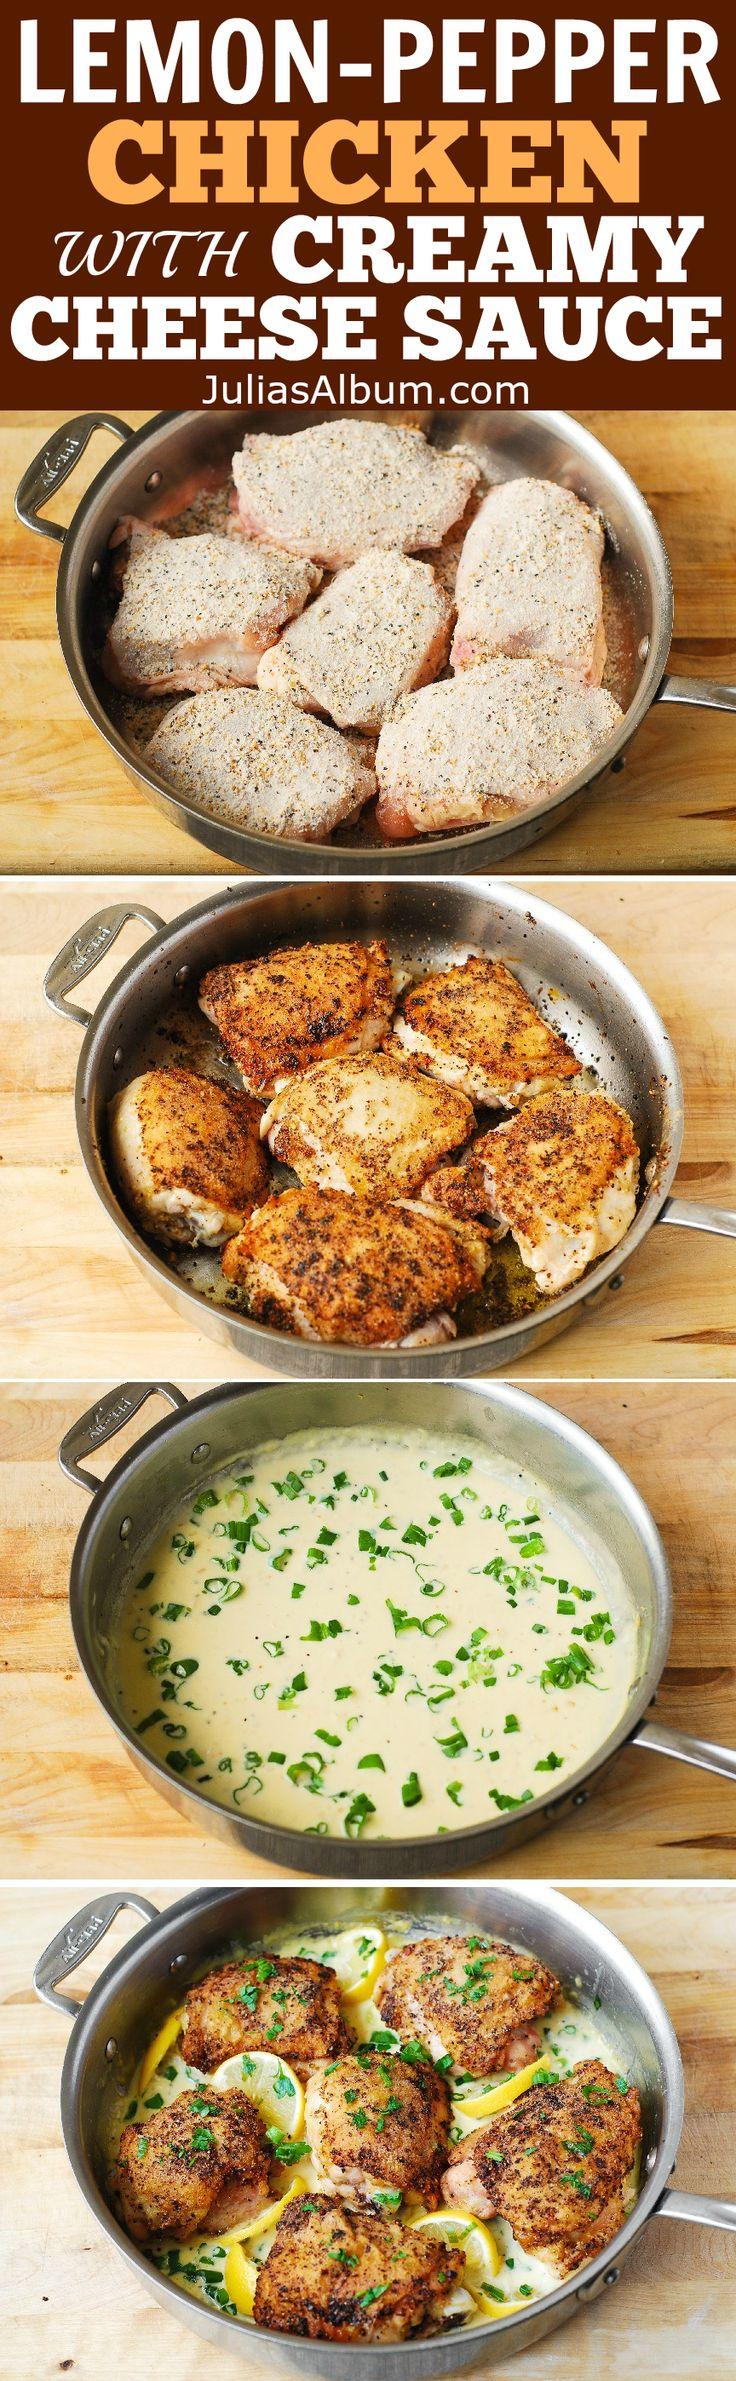 1000+ ideas about Mozzarella Chicken on Pinterest ...